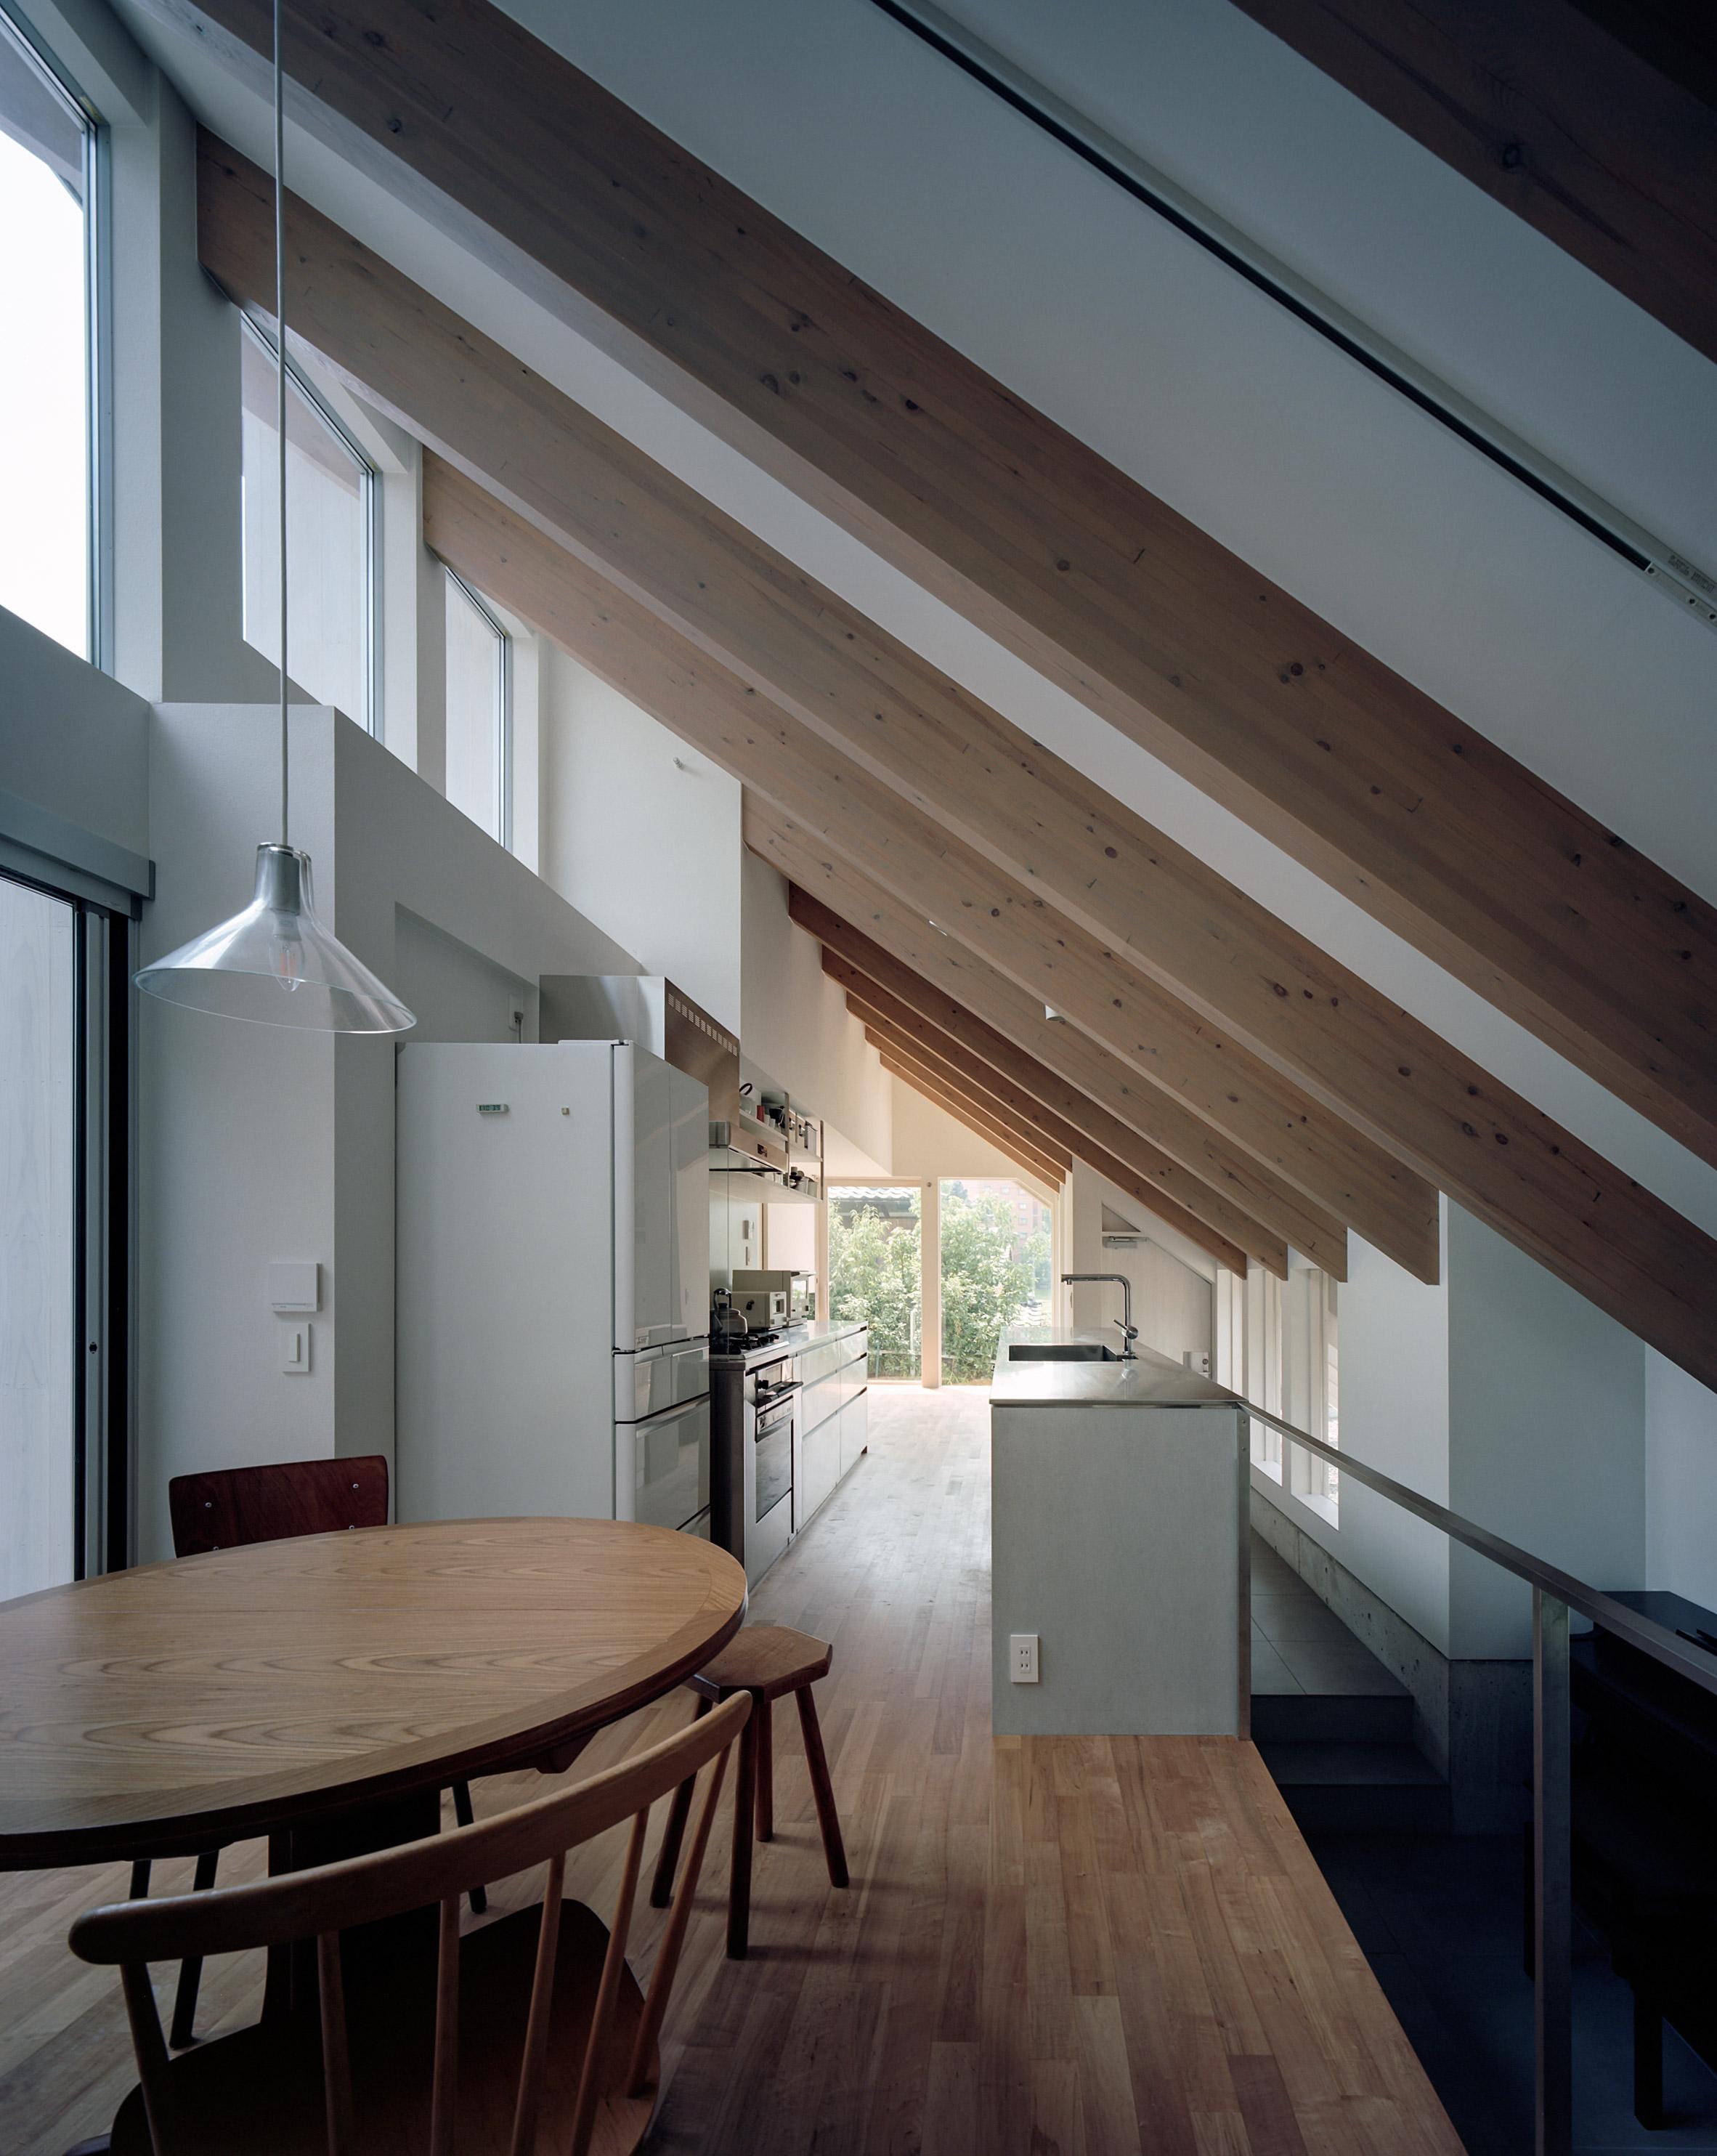 House in Gakuenmae by FujiwaraMuro Architects